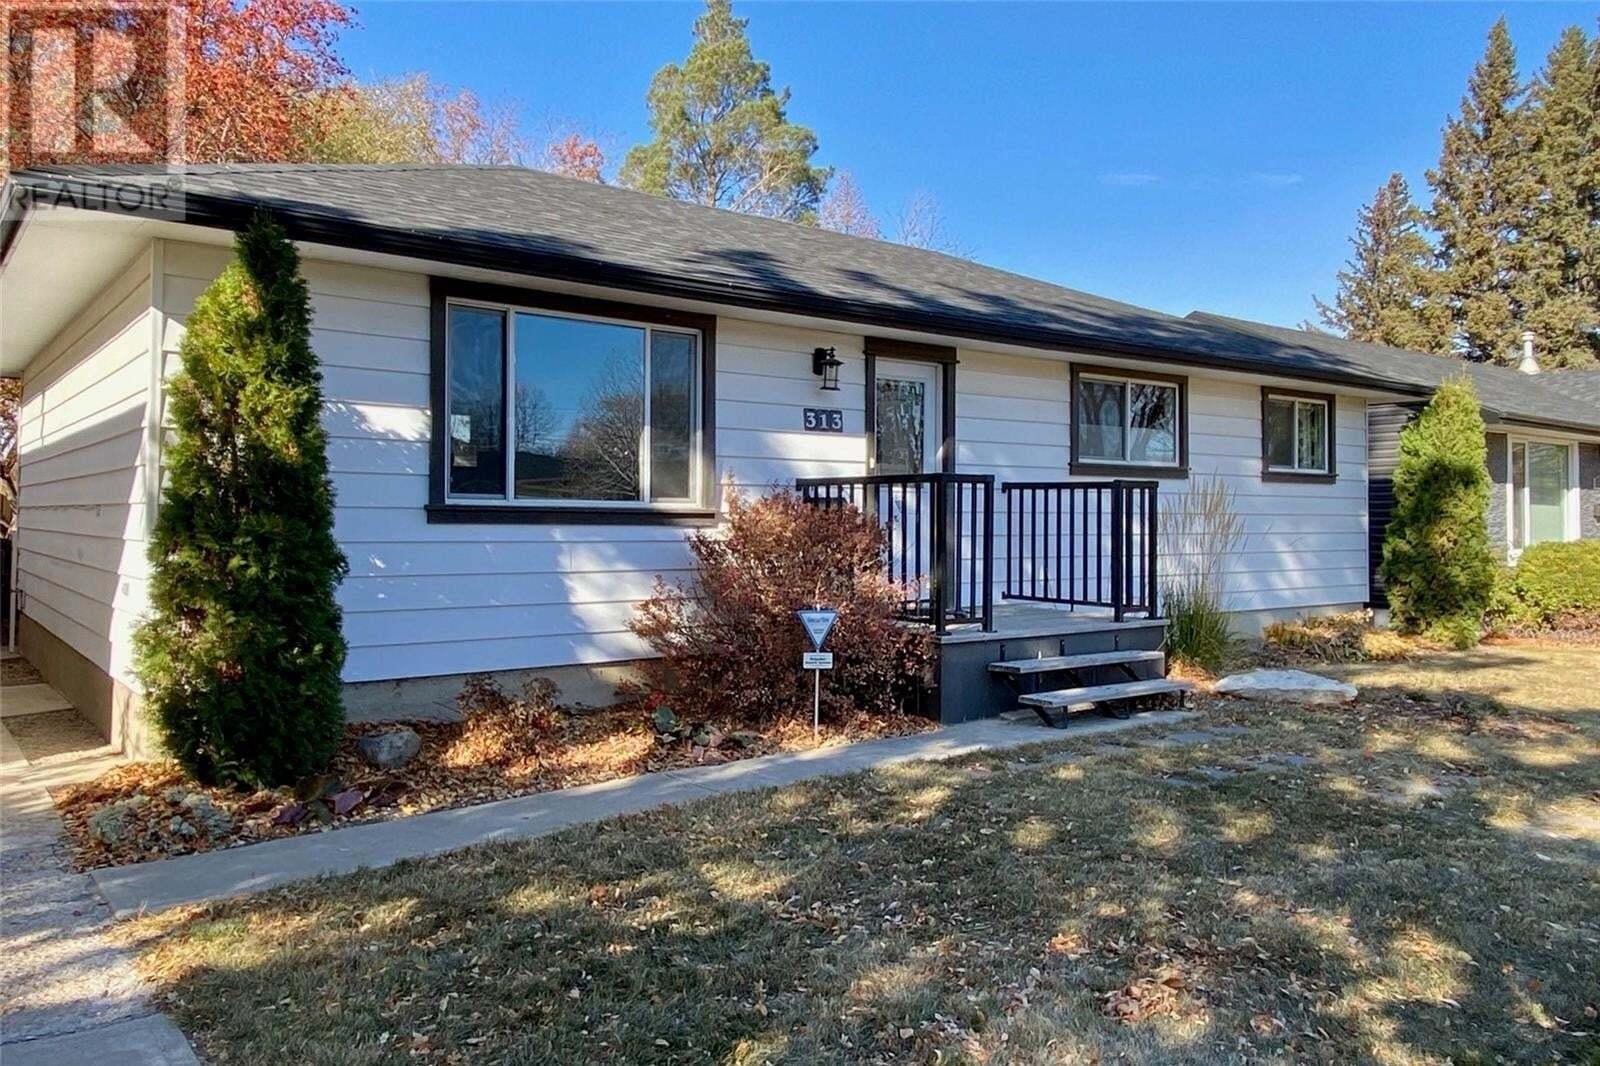 House for sale at 313 Vancouver Ave N Saskatoon Saskatchewan - MLS: SK830706